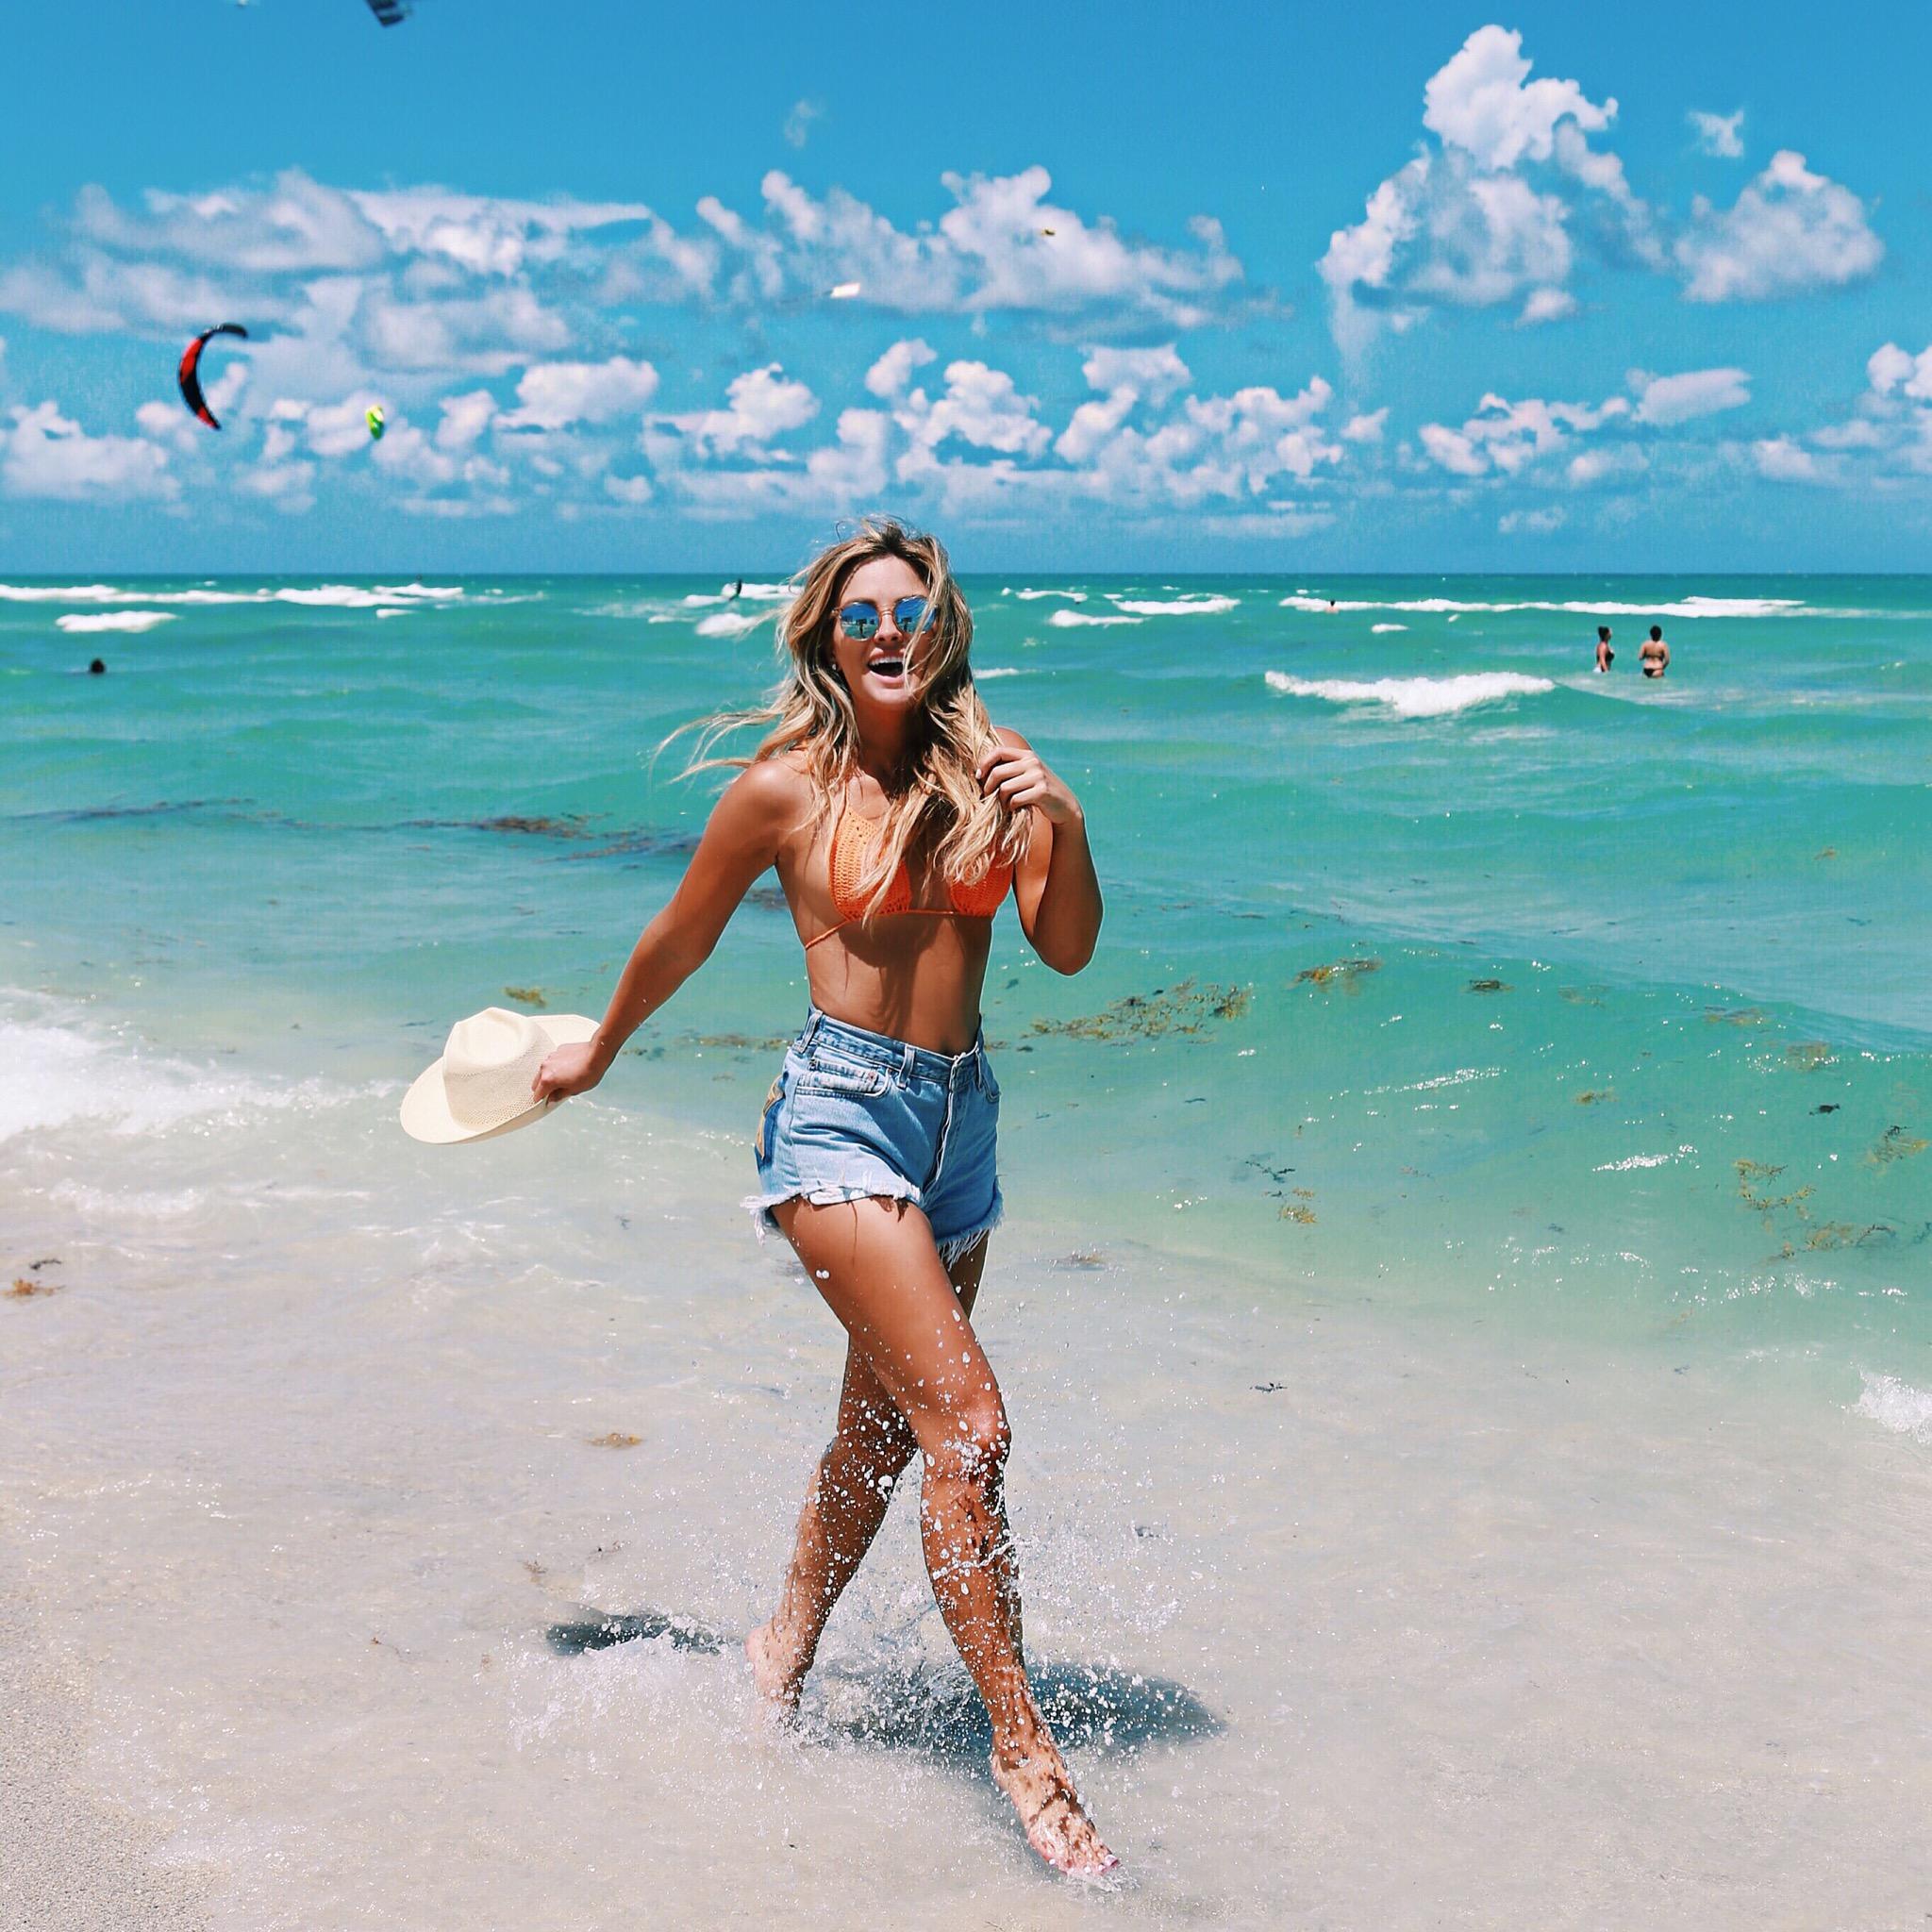 Becca Tilley - A Lifestyle & Travel Blog by Becca Tilley